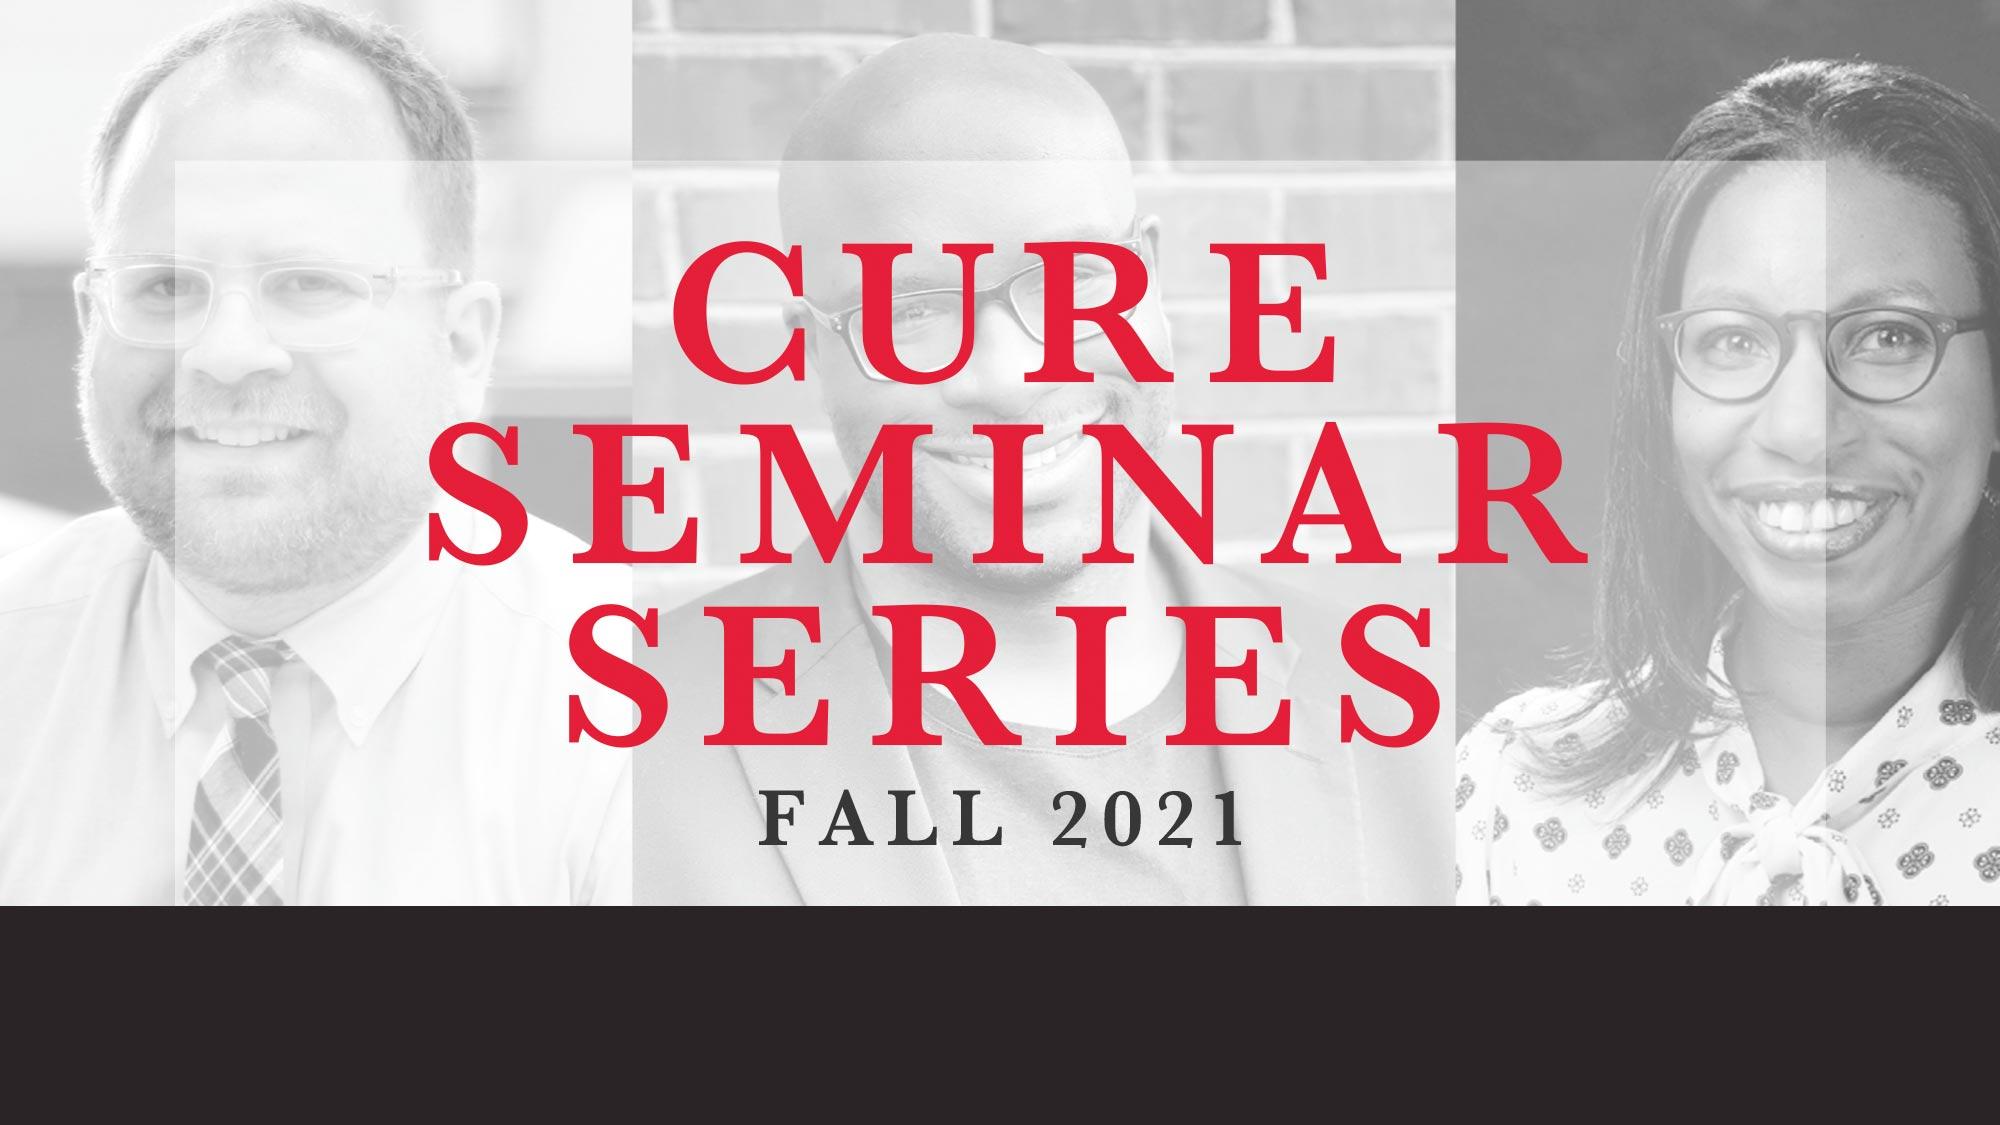 Fall 2021 CURE Seminar Series starts October 7